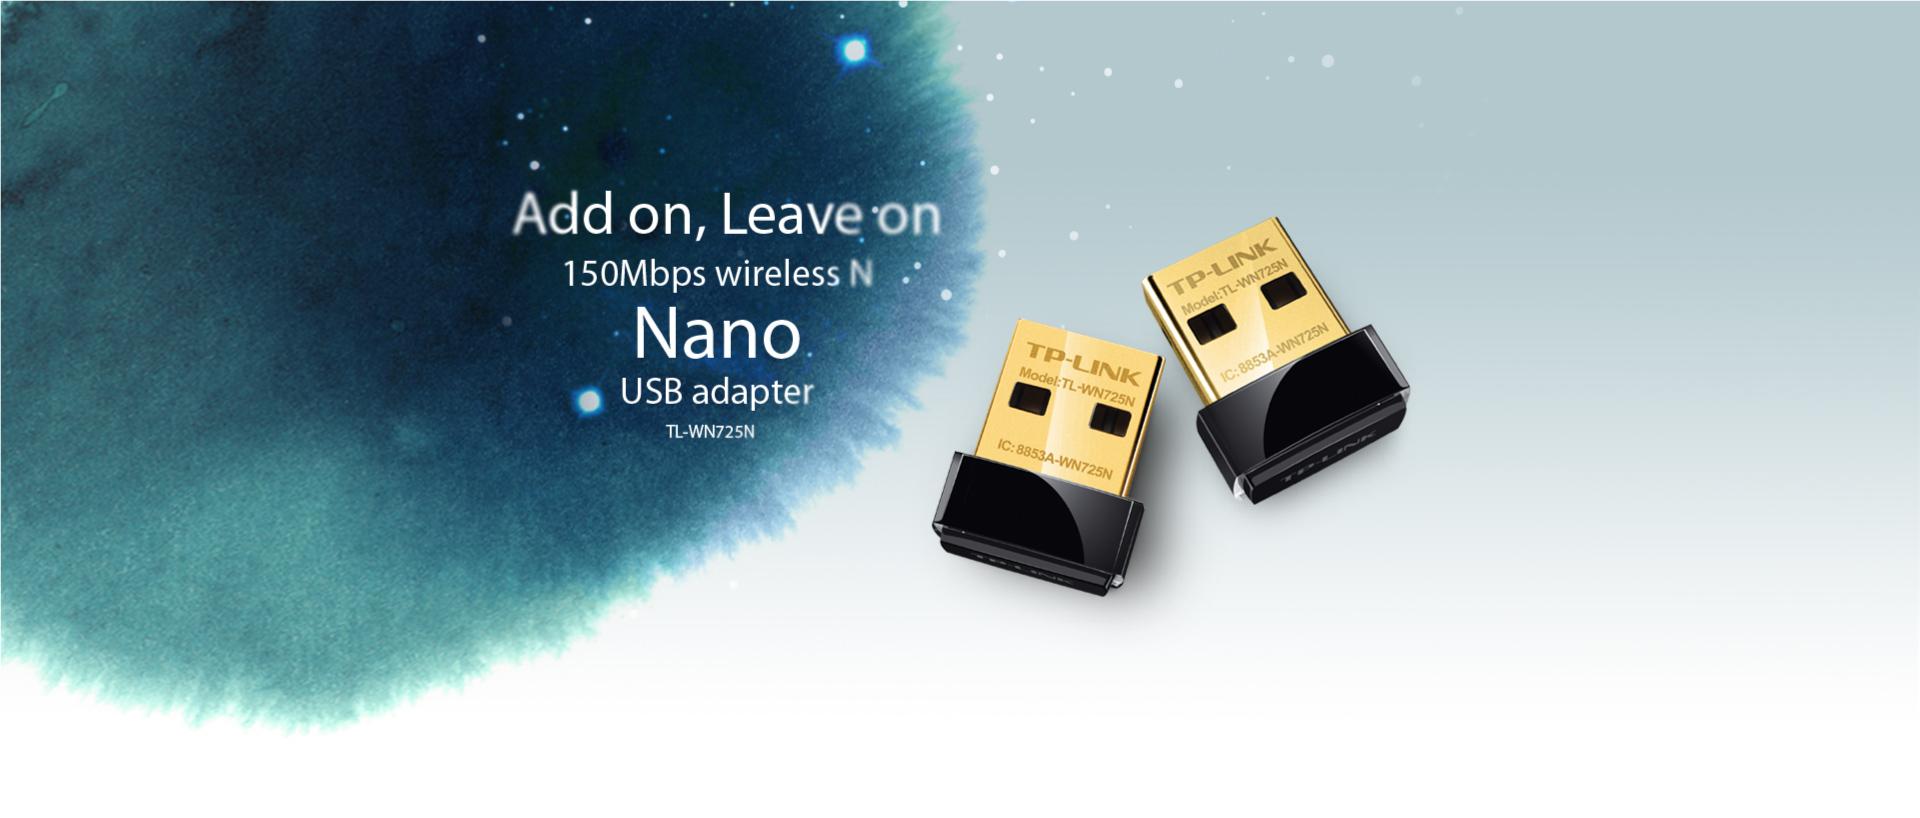 TP-Link 150Mbps Advanced Security Wi-Fi Wireless N Nano USB AdapterTL-WN725N